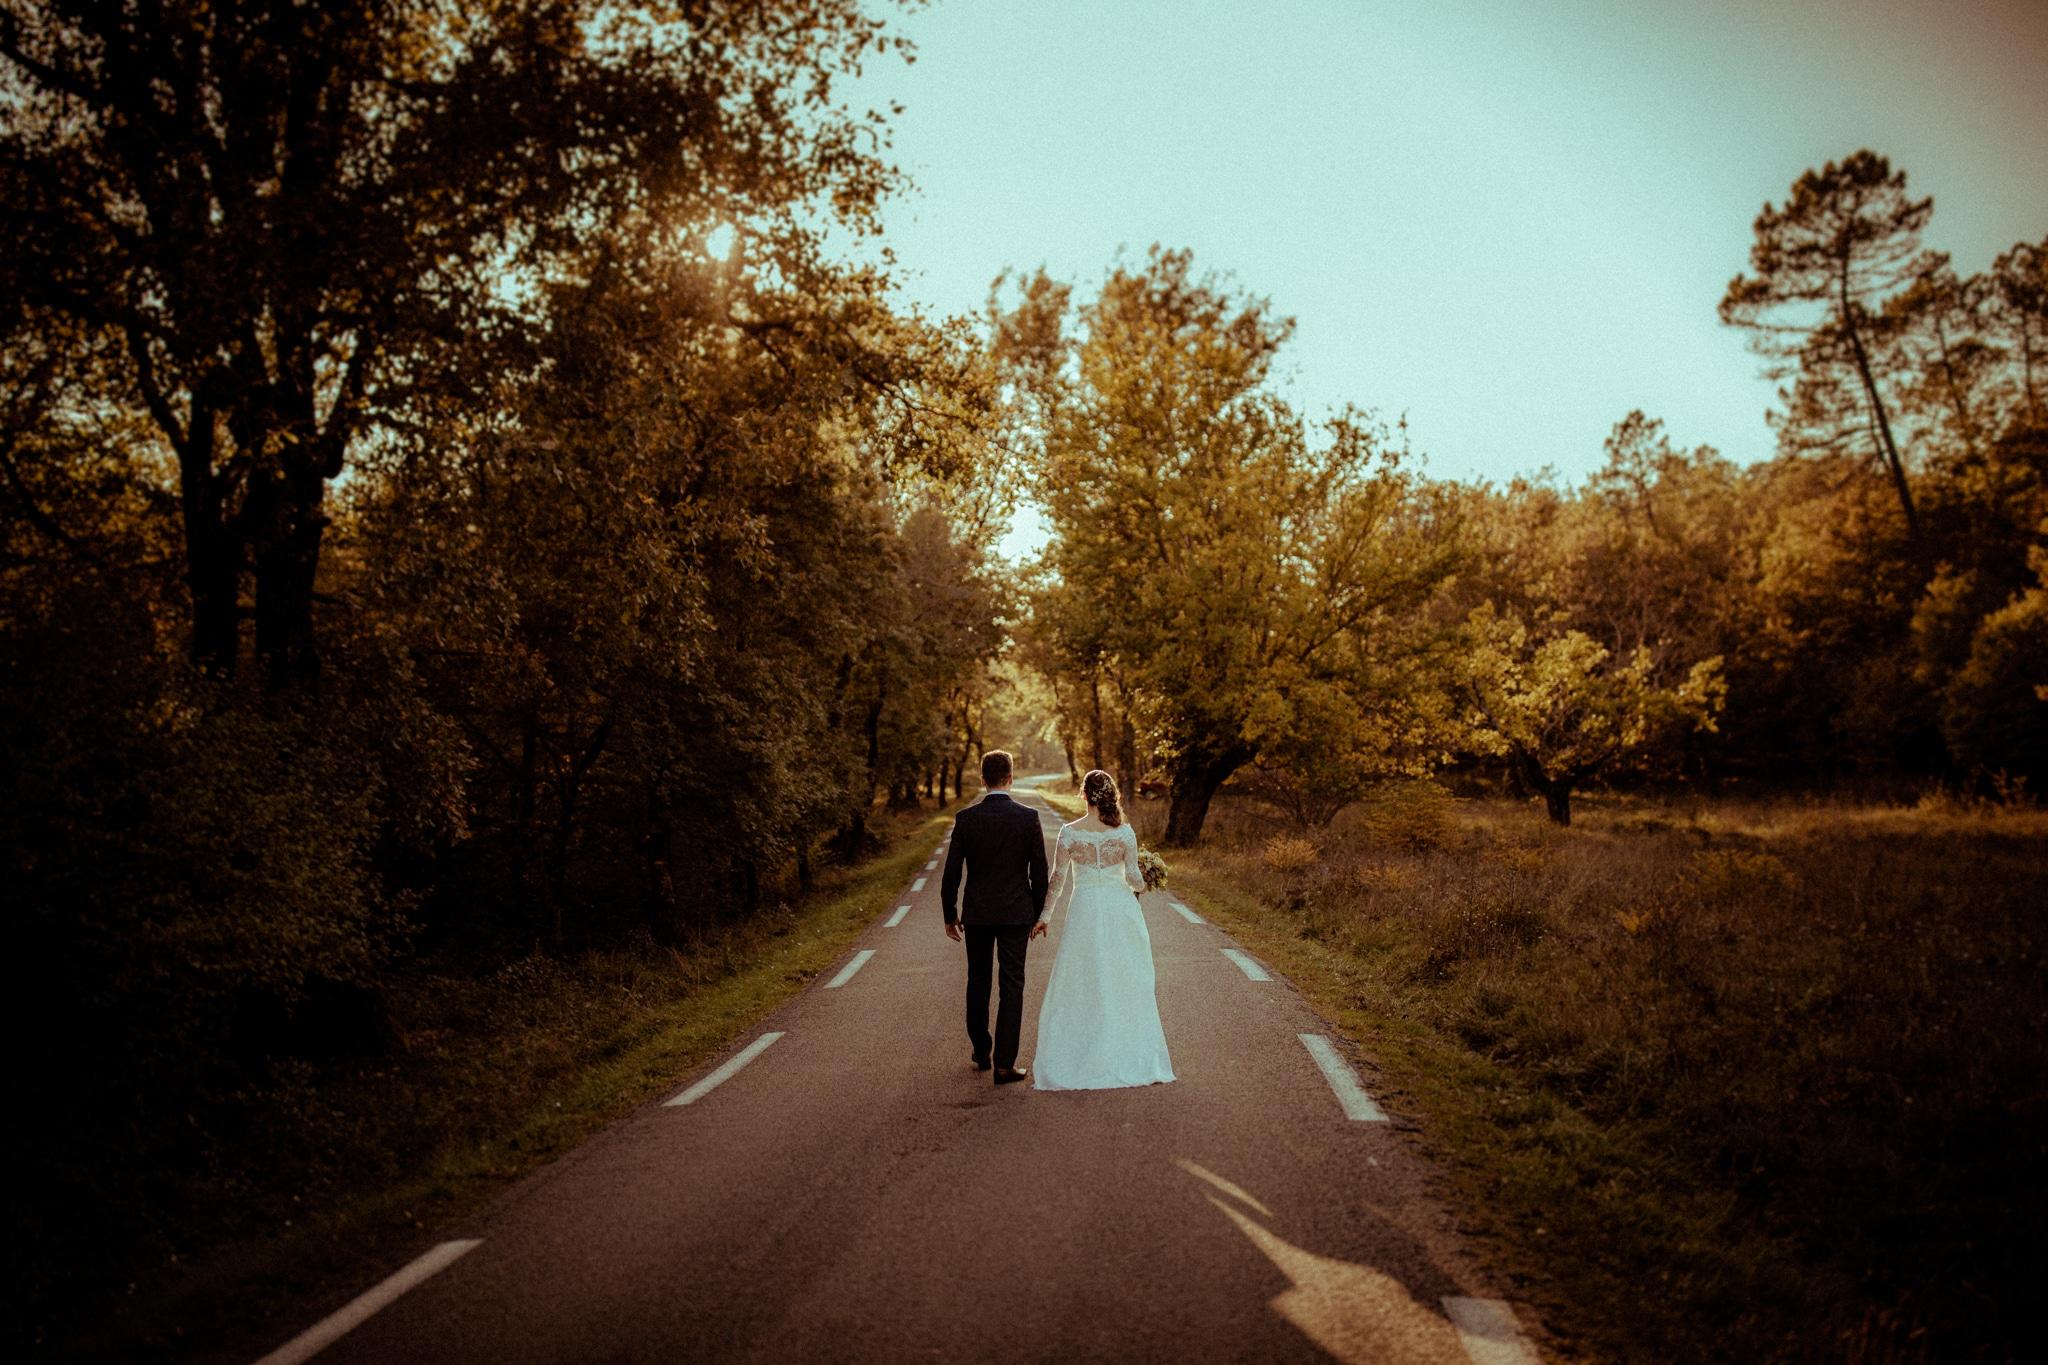 terence baelen photographe mariage grand est